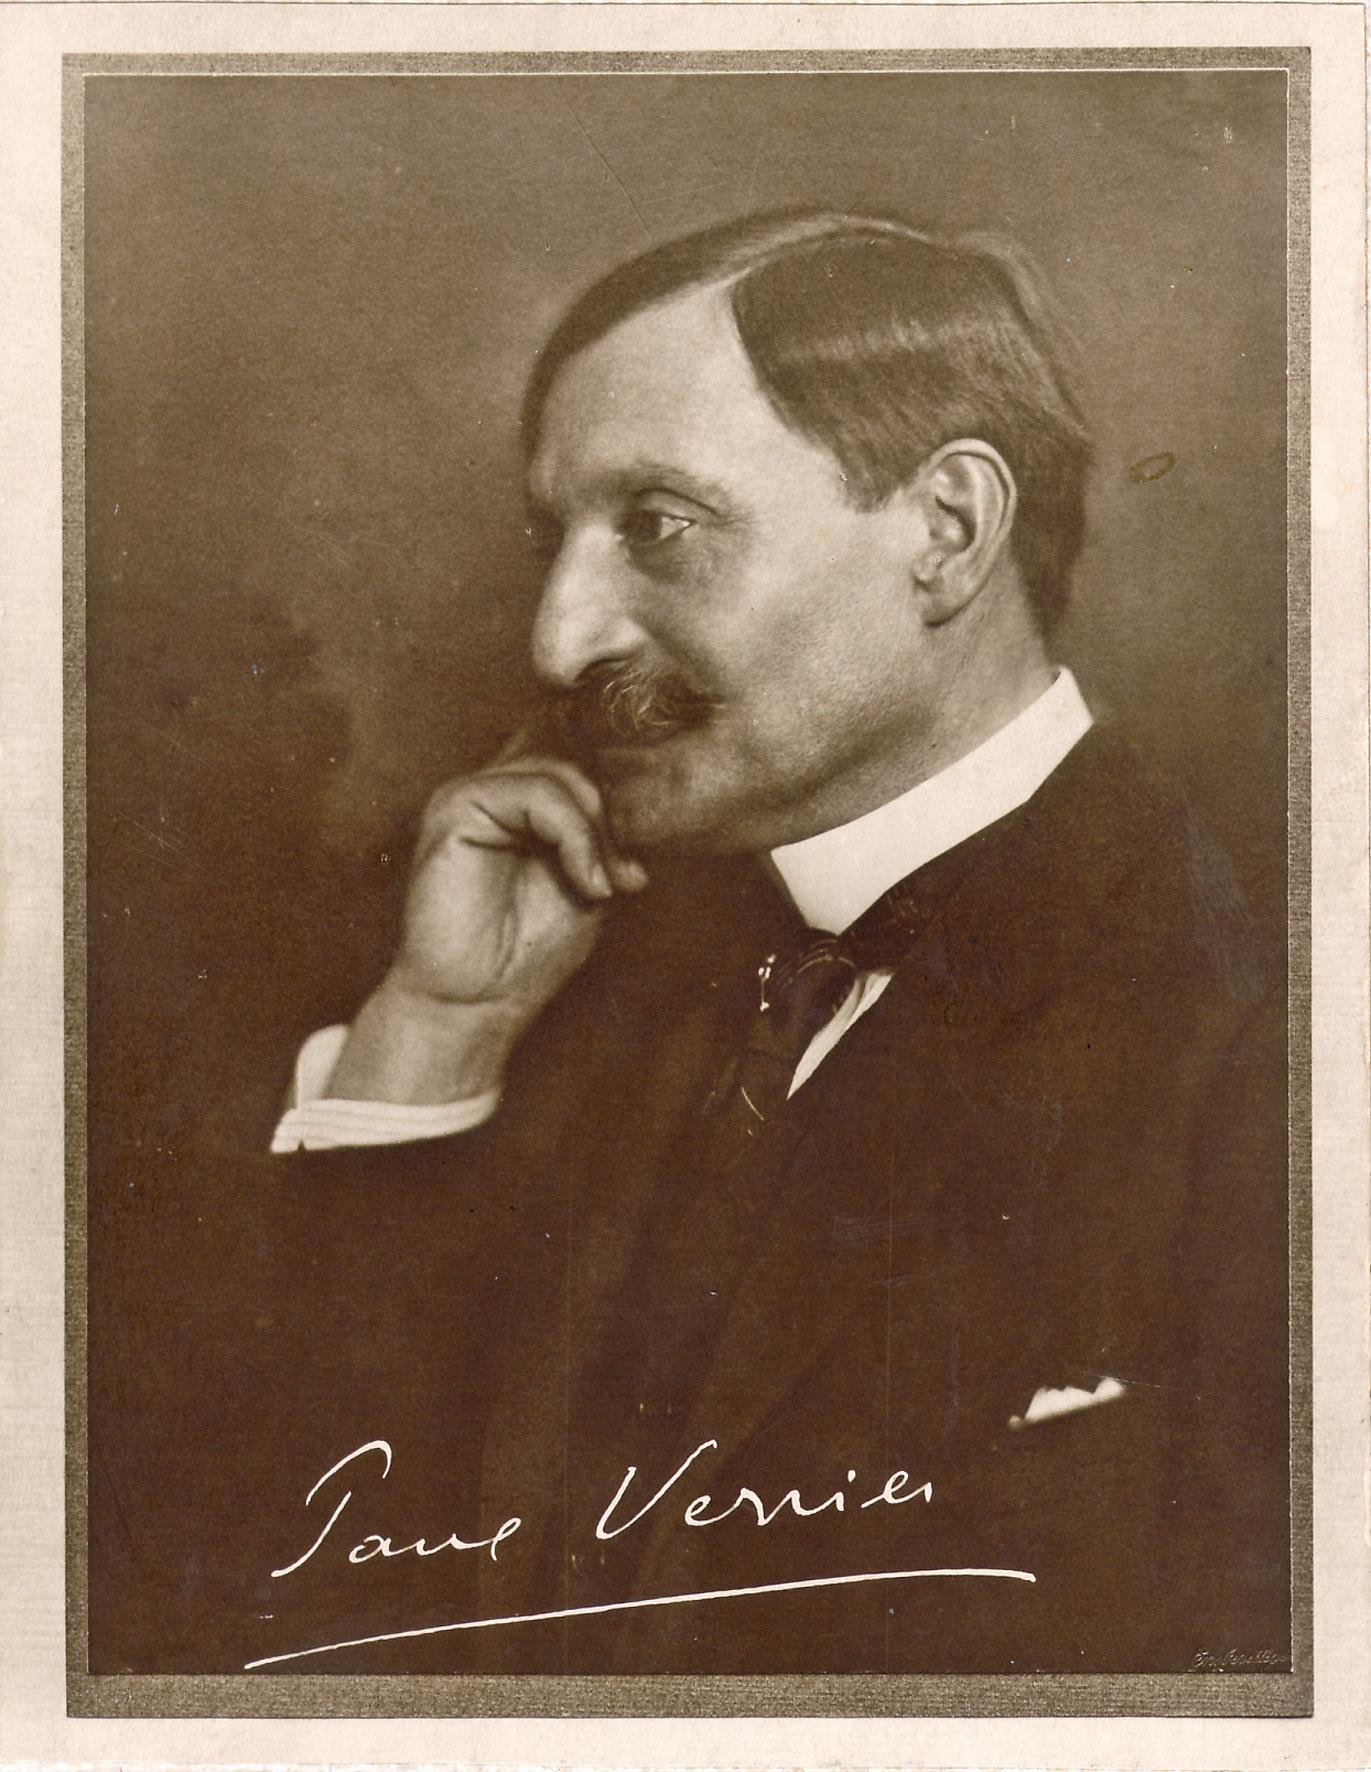 21. februar 1919. Paul Verriers memorandum til den franske regering vedr. afstemningen i Slesvig